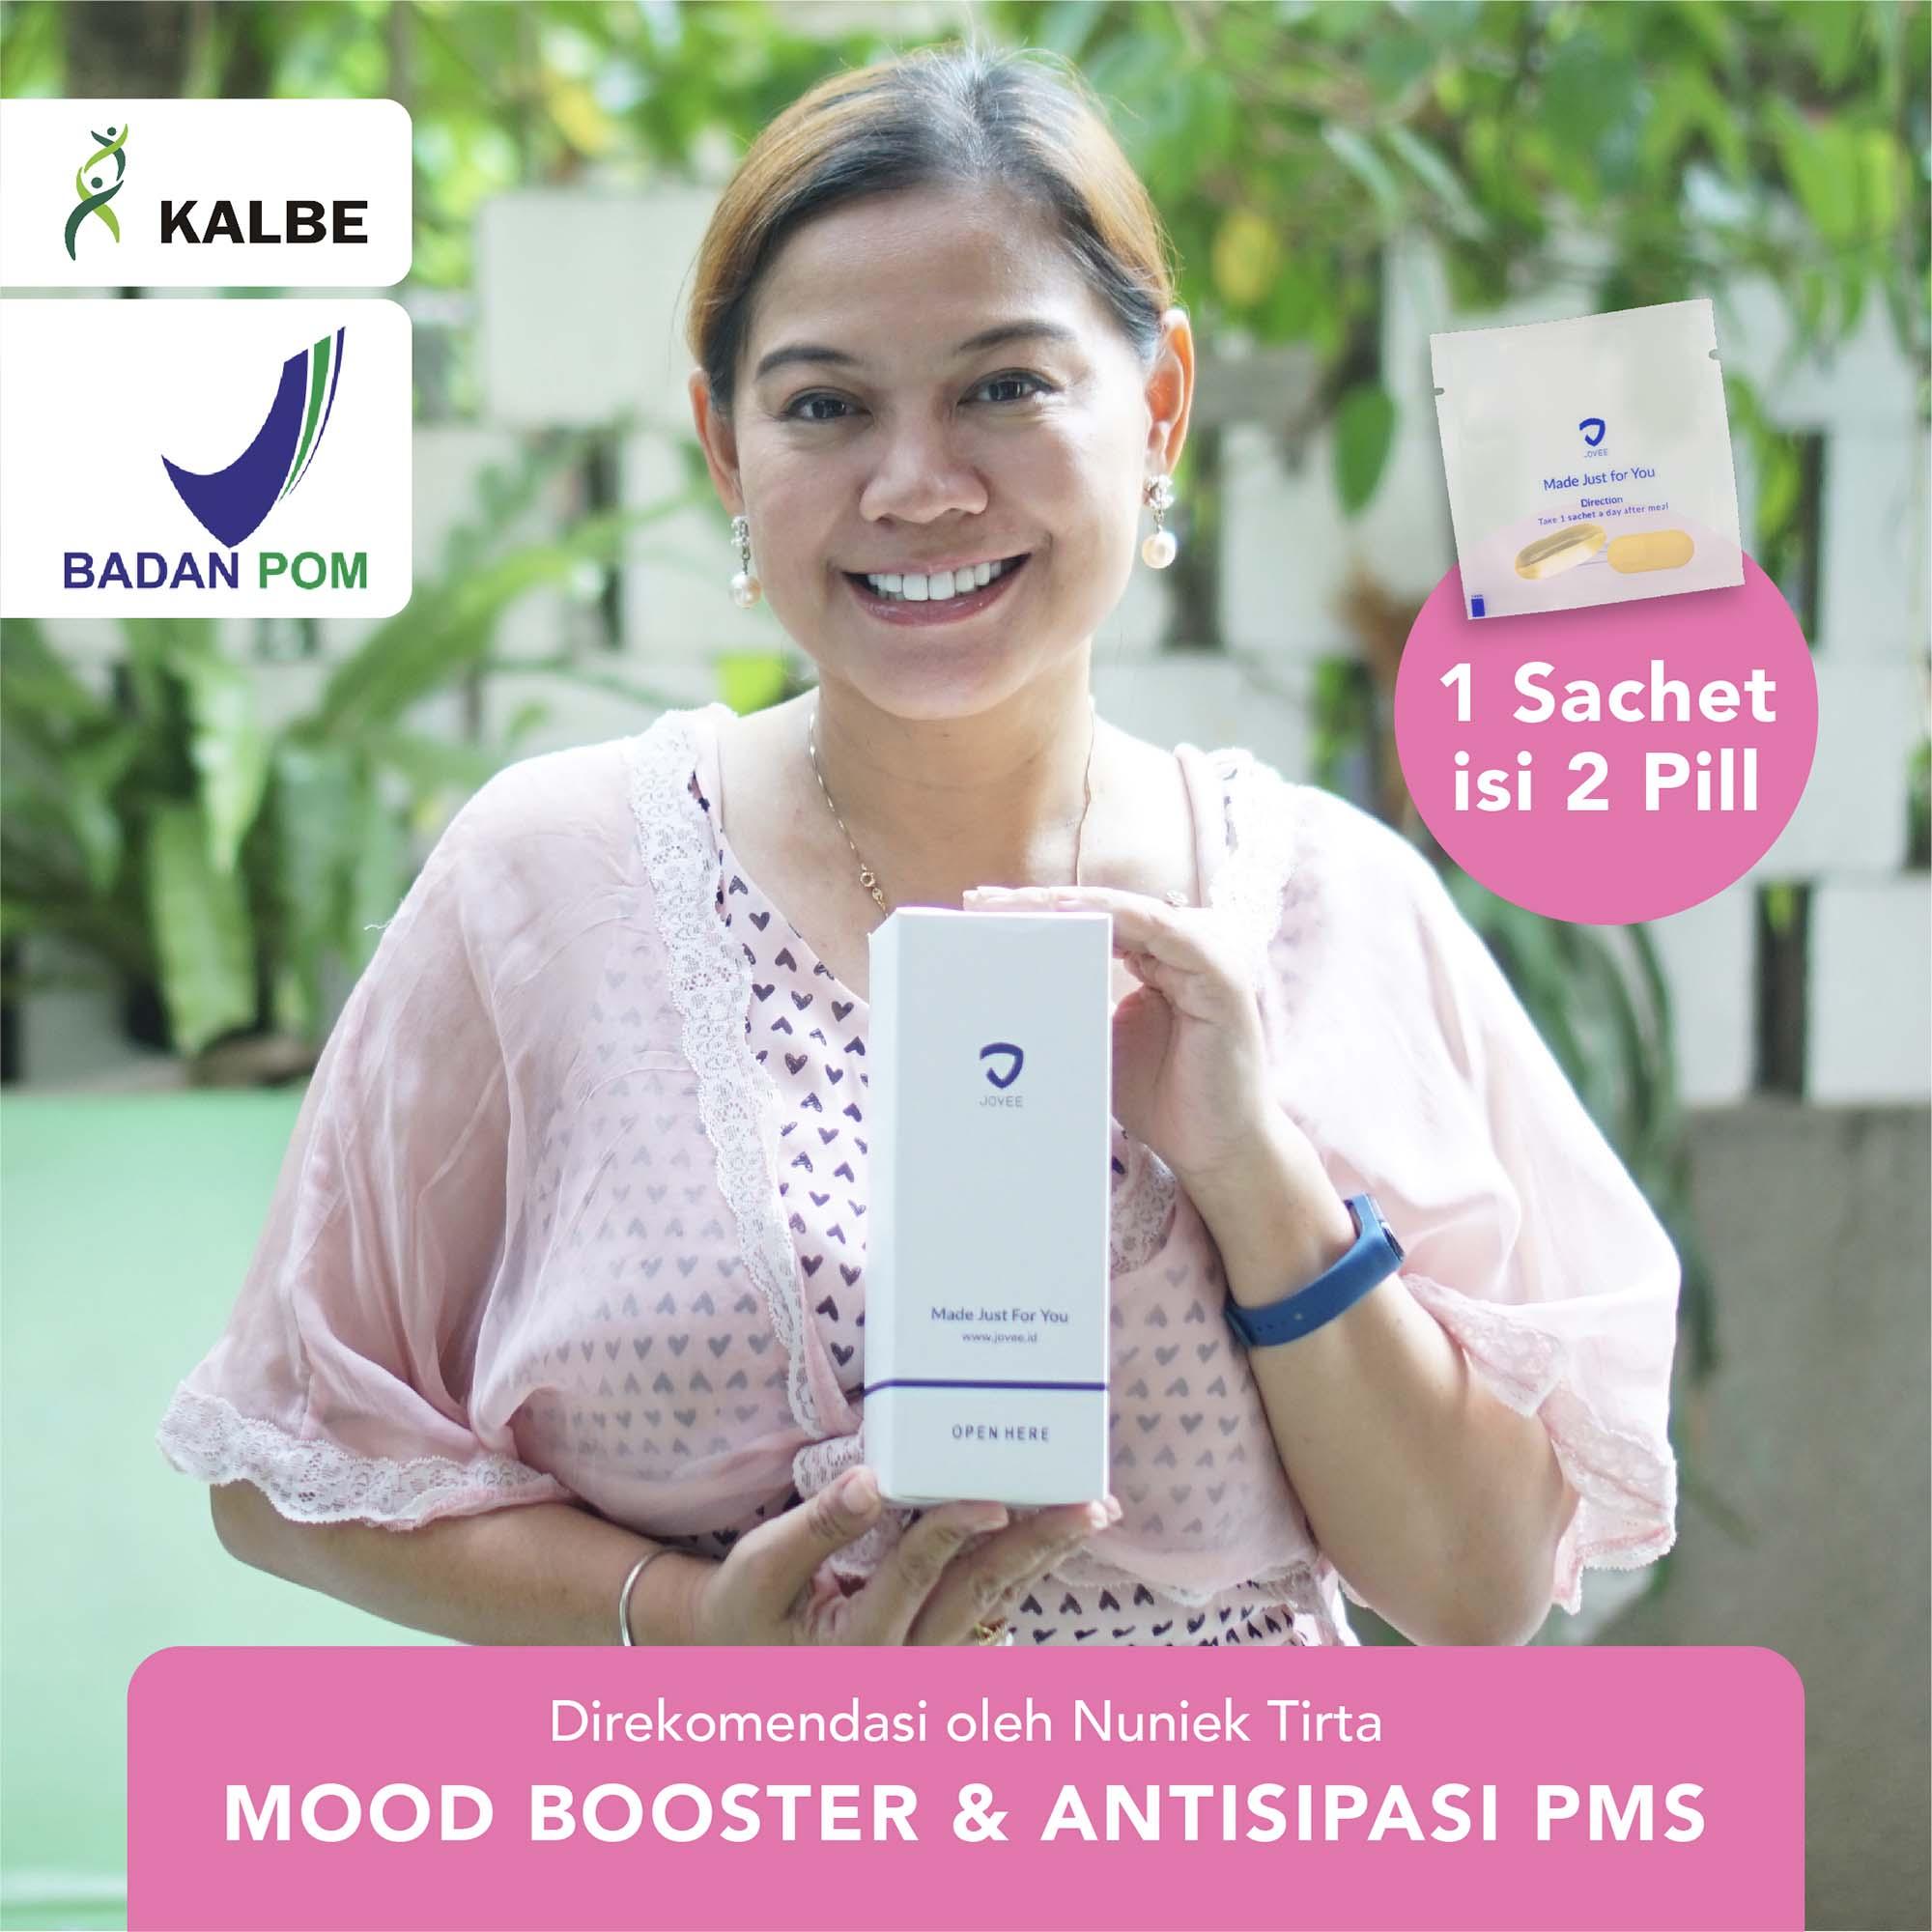 Mood Booster (Anti Mood Swing), Antisipasi PMS & Menopause by Nuniek Tirta | Blackmores BPOM KALBE